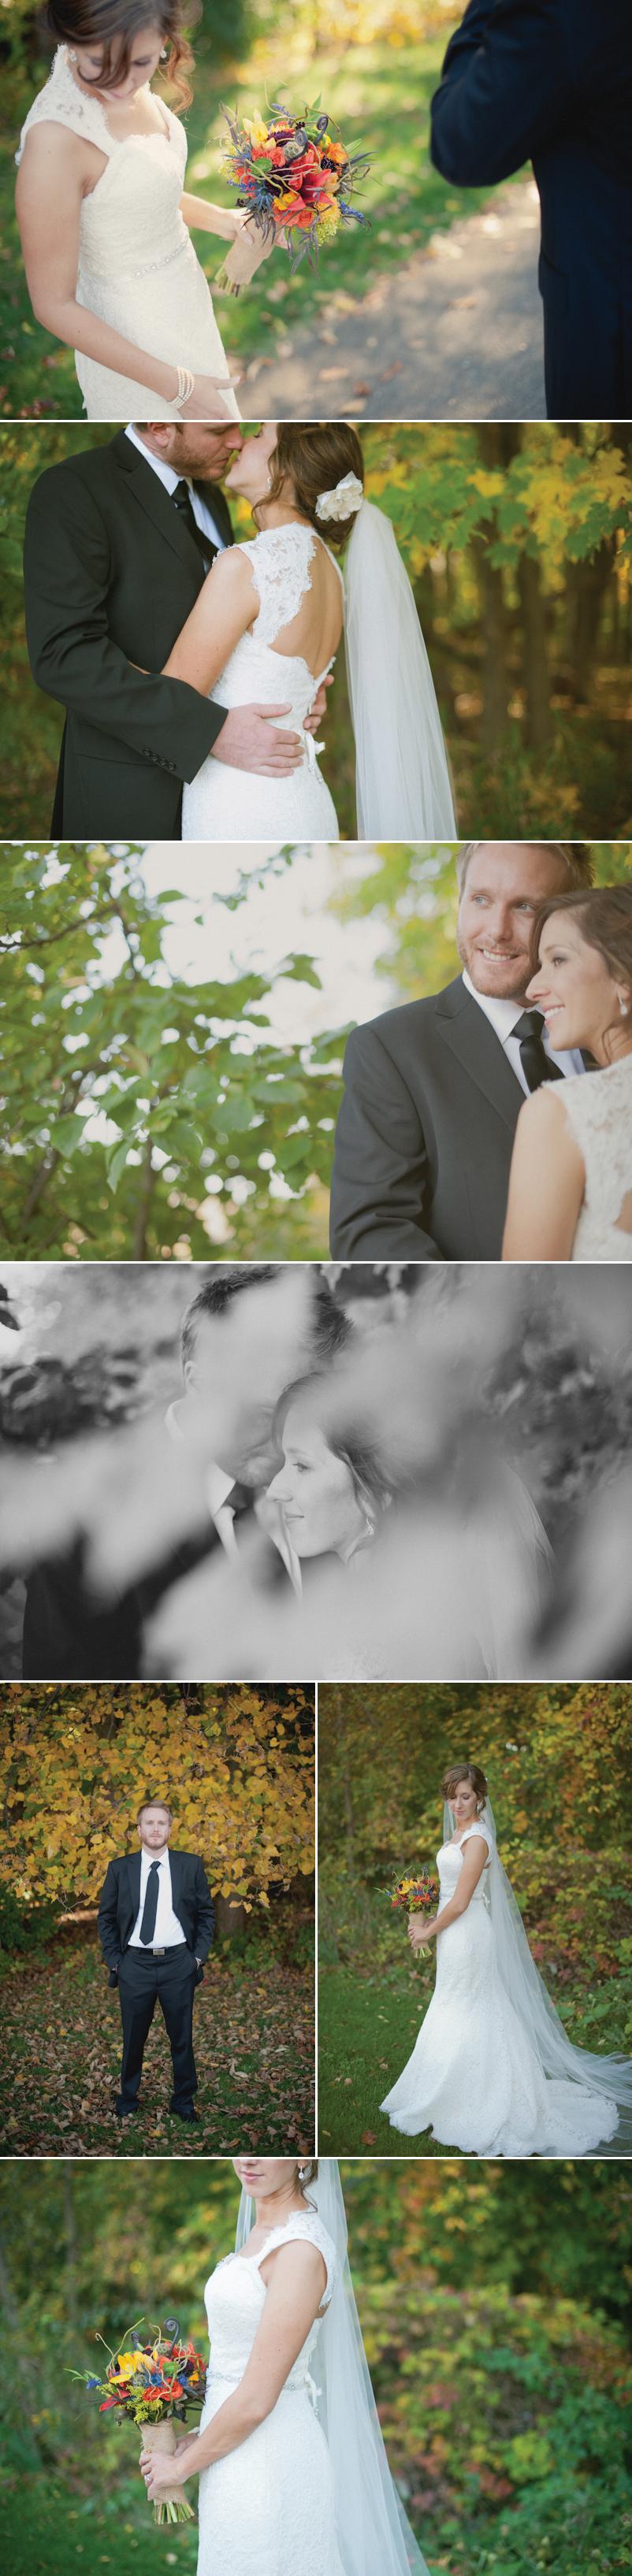 byron colby barn wedding photography, barn wedding photography, rustic wedding photography, illinois wedding photography, chicagoland wedding photographer, wheaton illinois wedding photography, modern wedding photography chicago